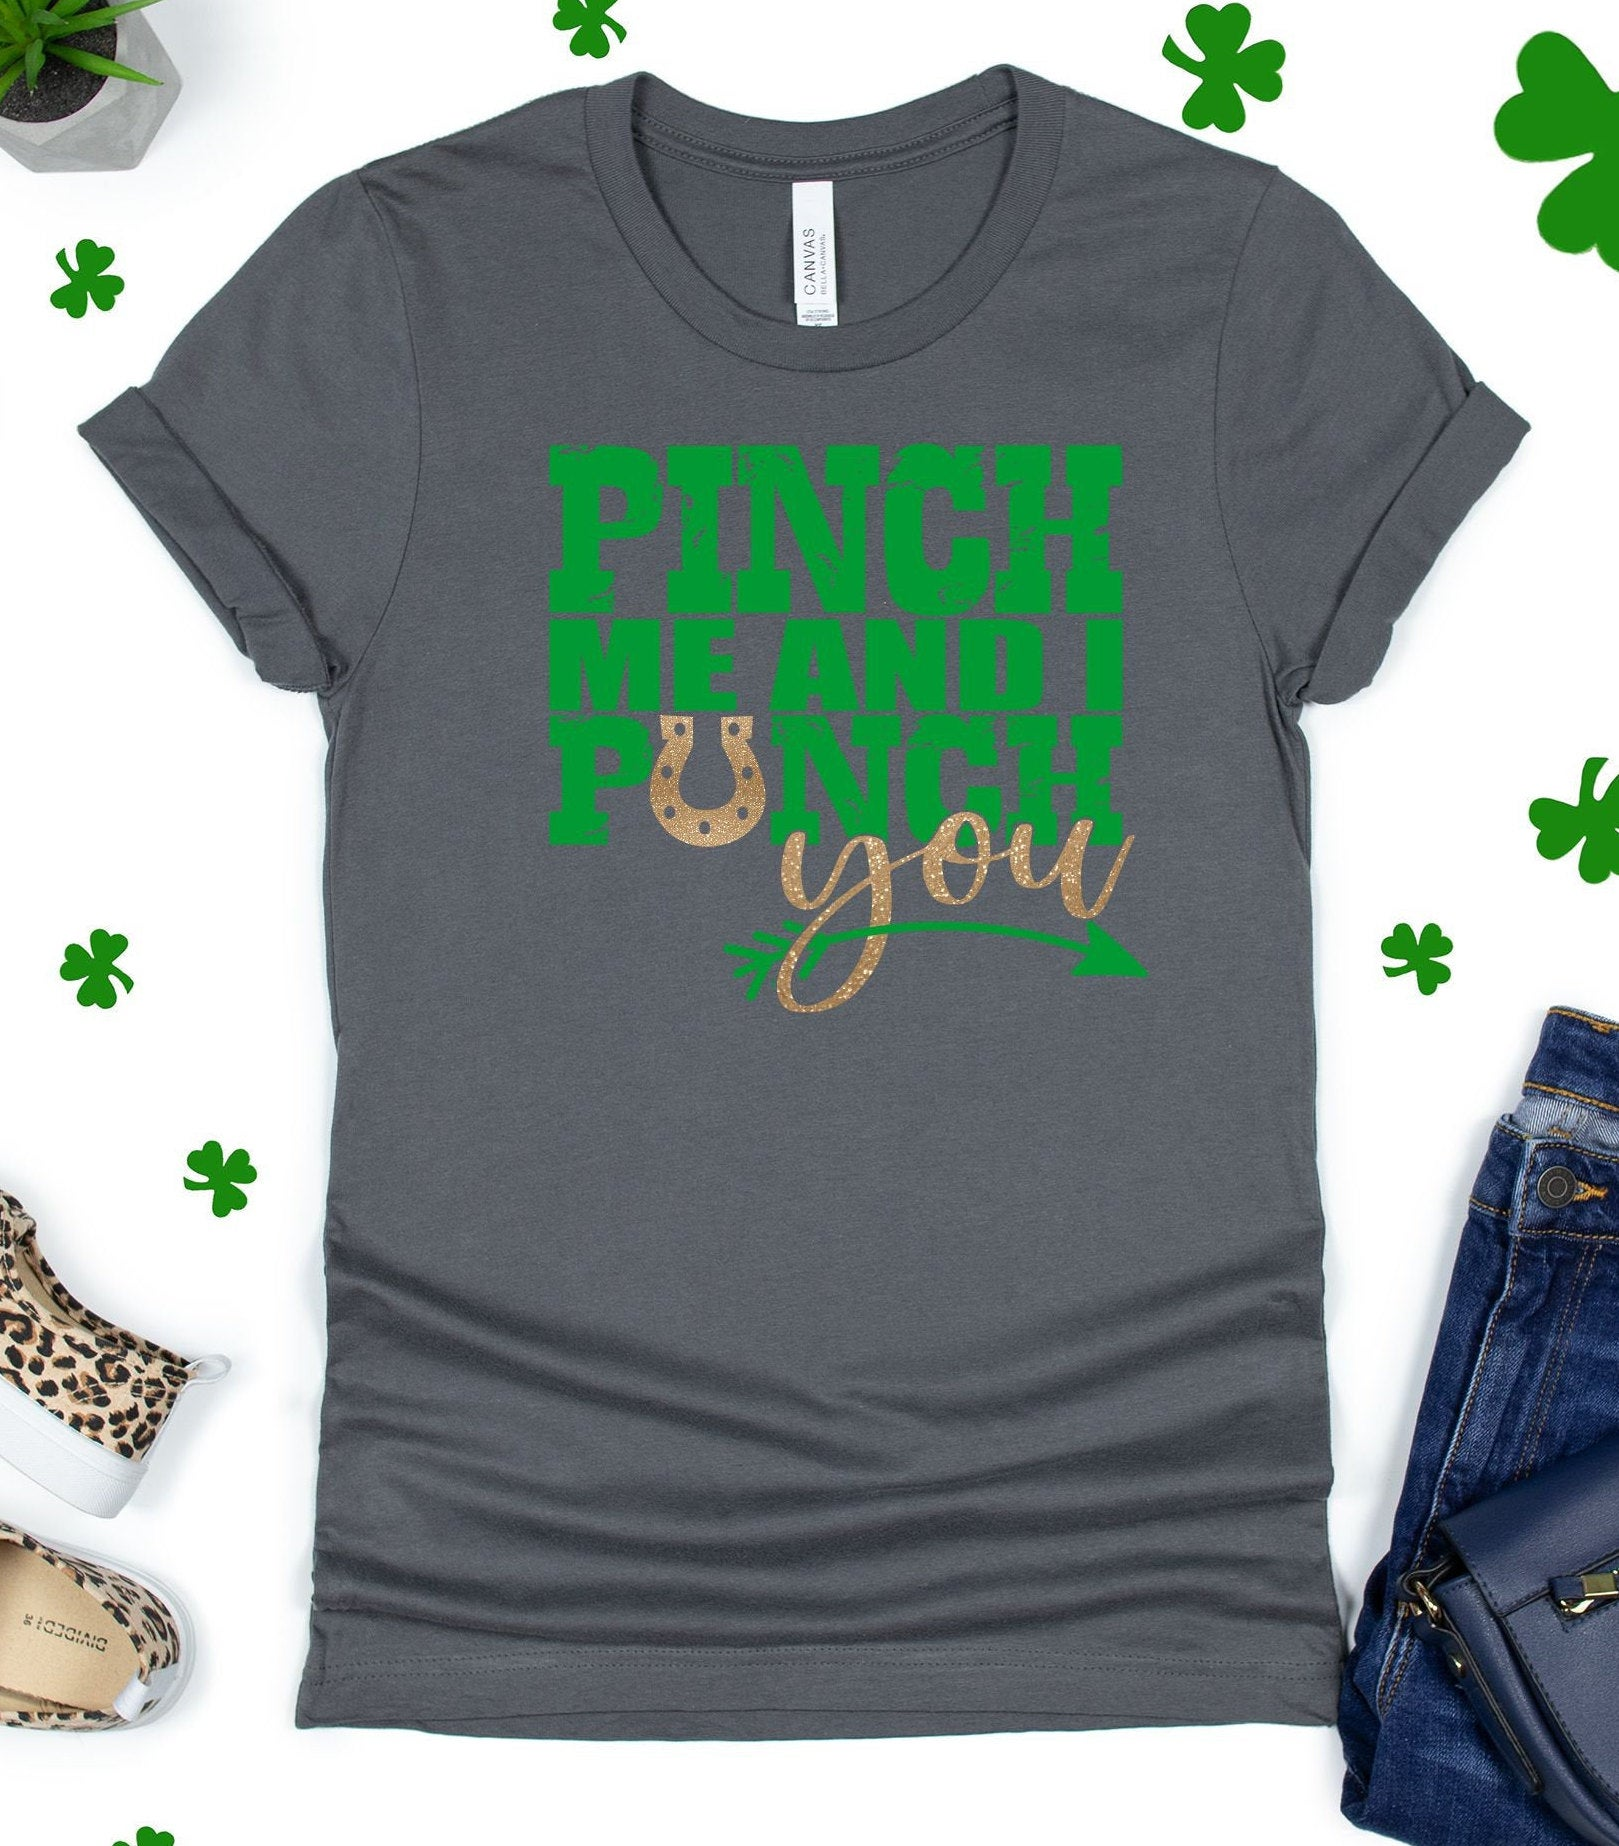 St-patricks-day-svg-pinch-me-i-punch-you-svg-irish-svg-beer-svg-shamrock-svg-st-patricks-day-svg-st-patricks-day-cut-file-cricut-60513efc